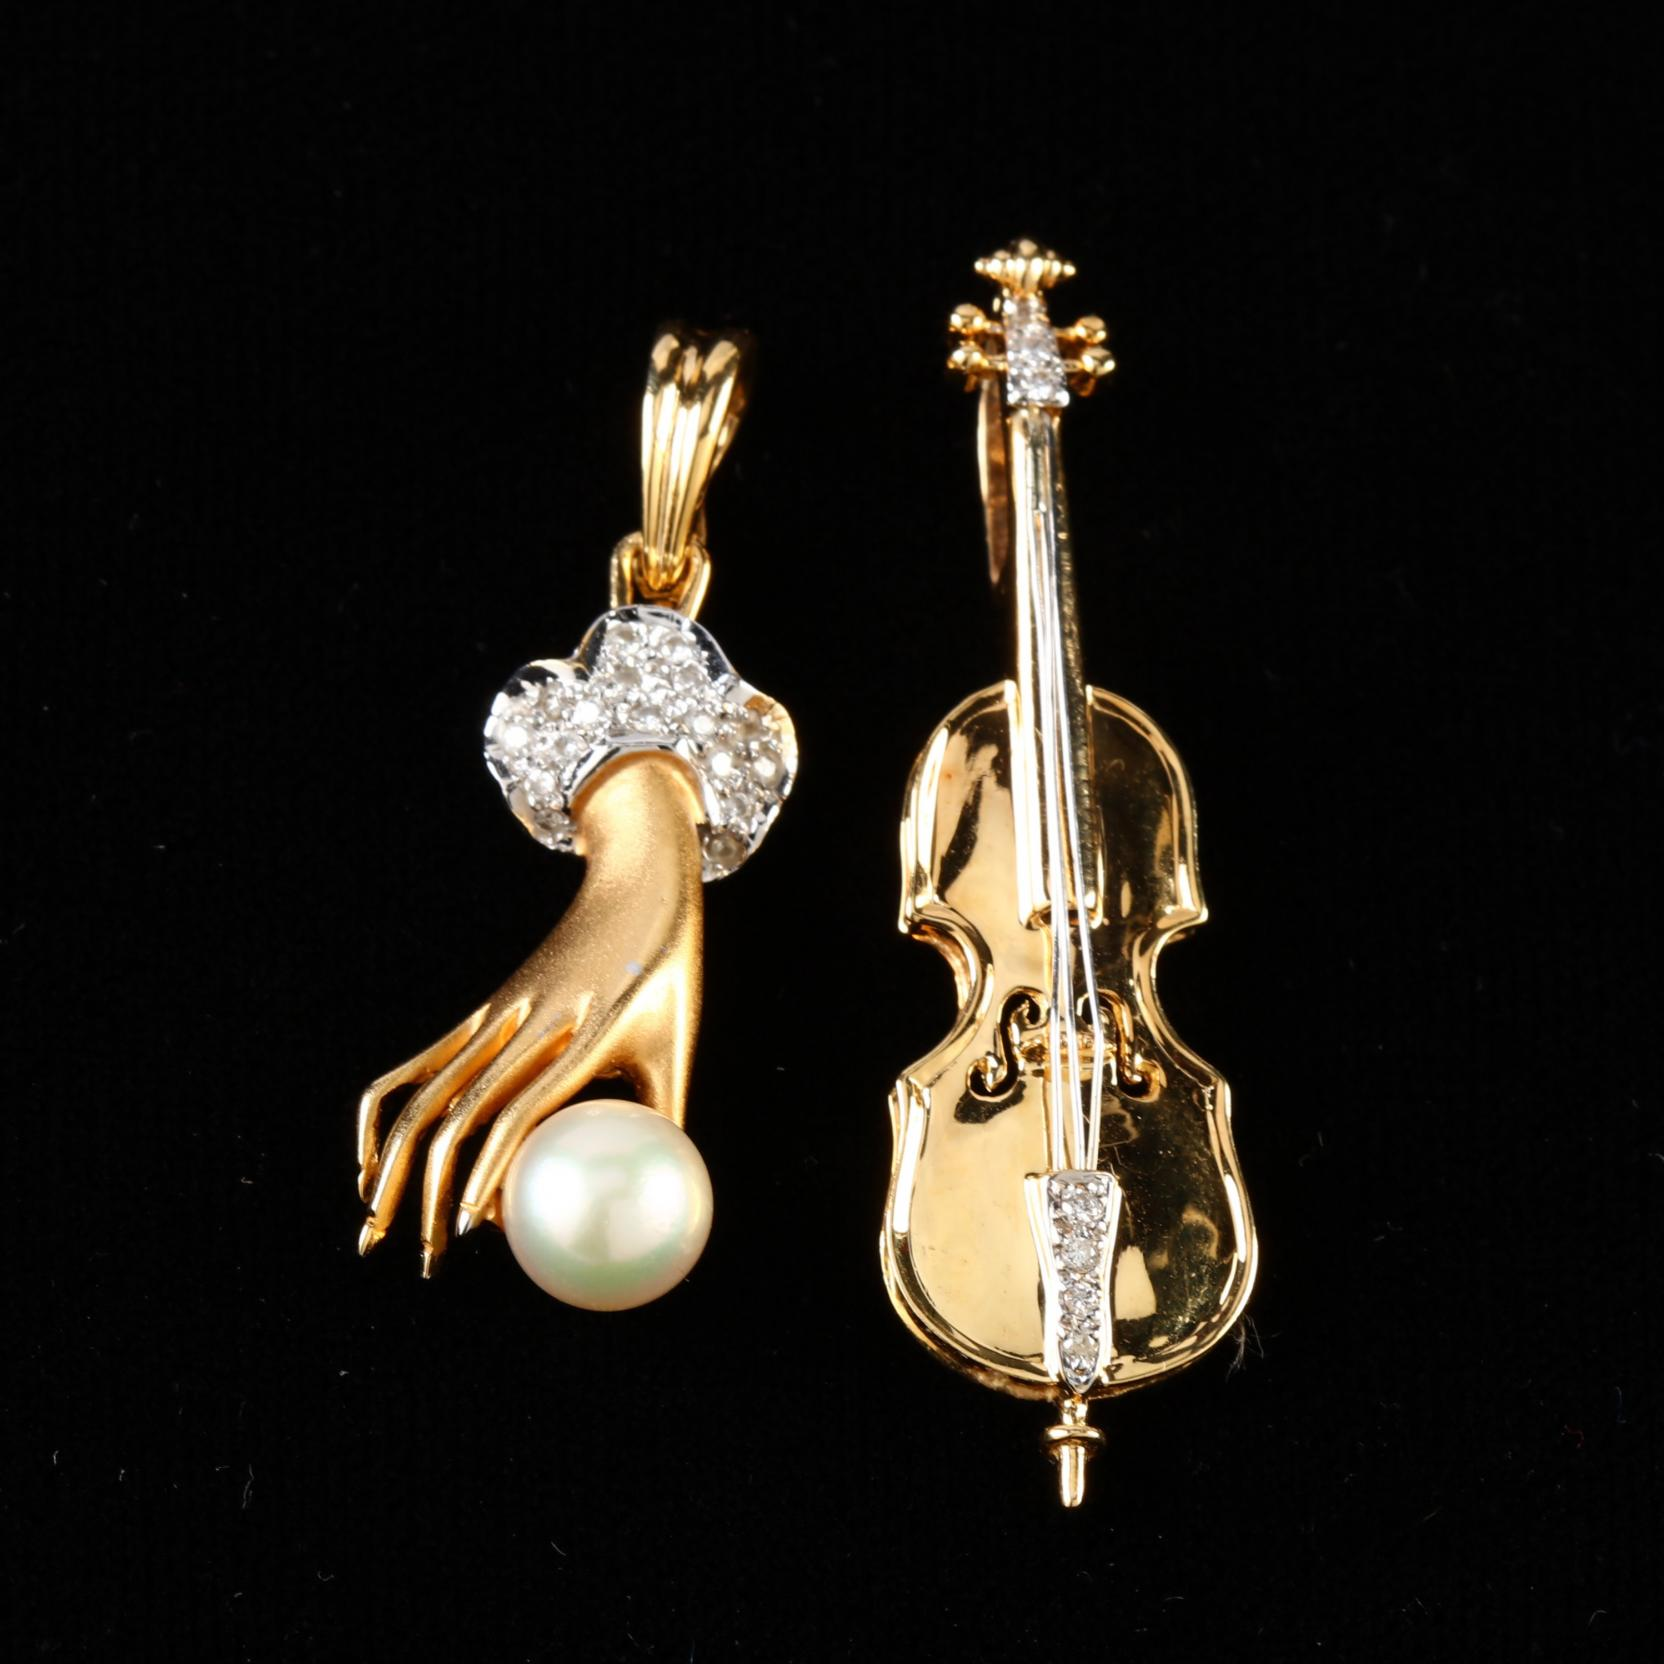 two-18kt-gold-and-gem-set-pendants